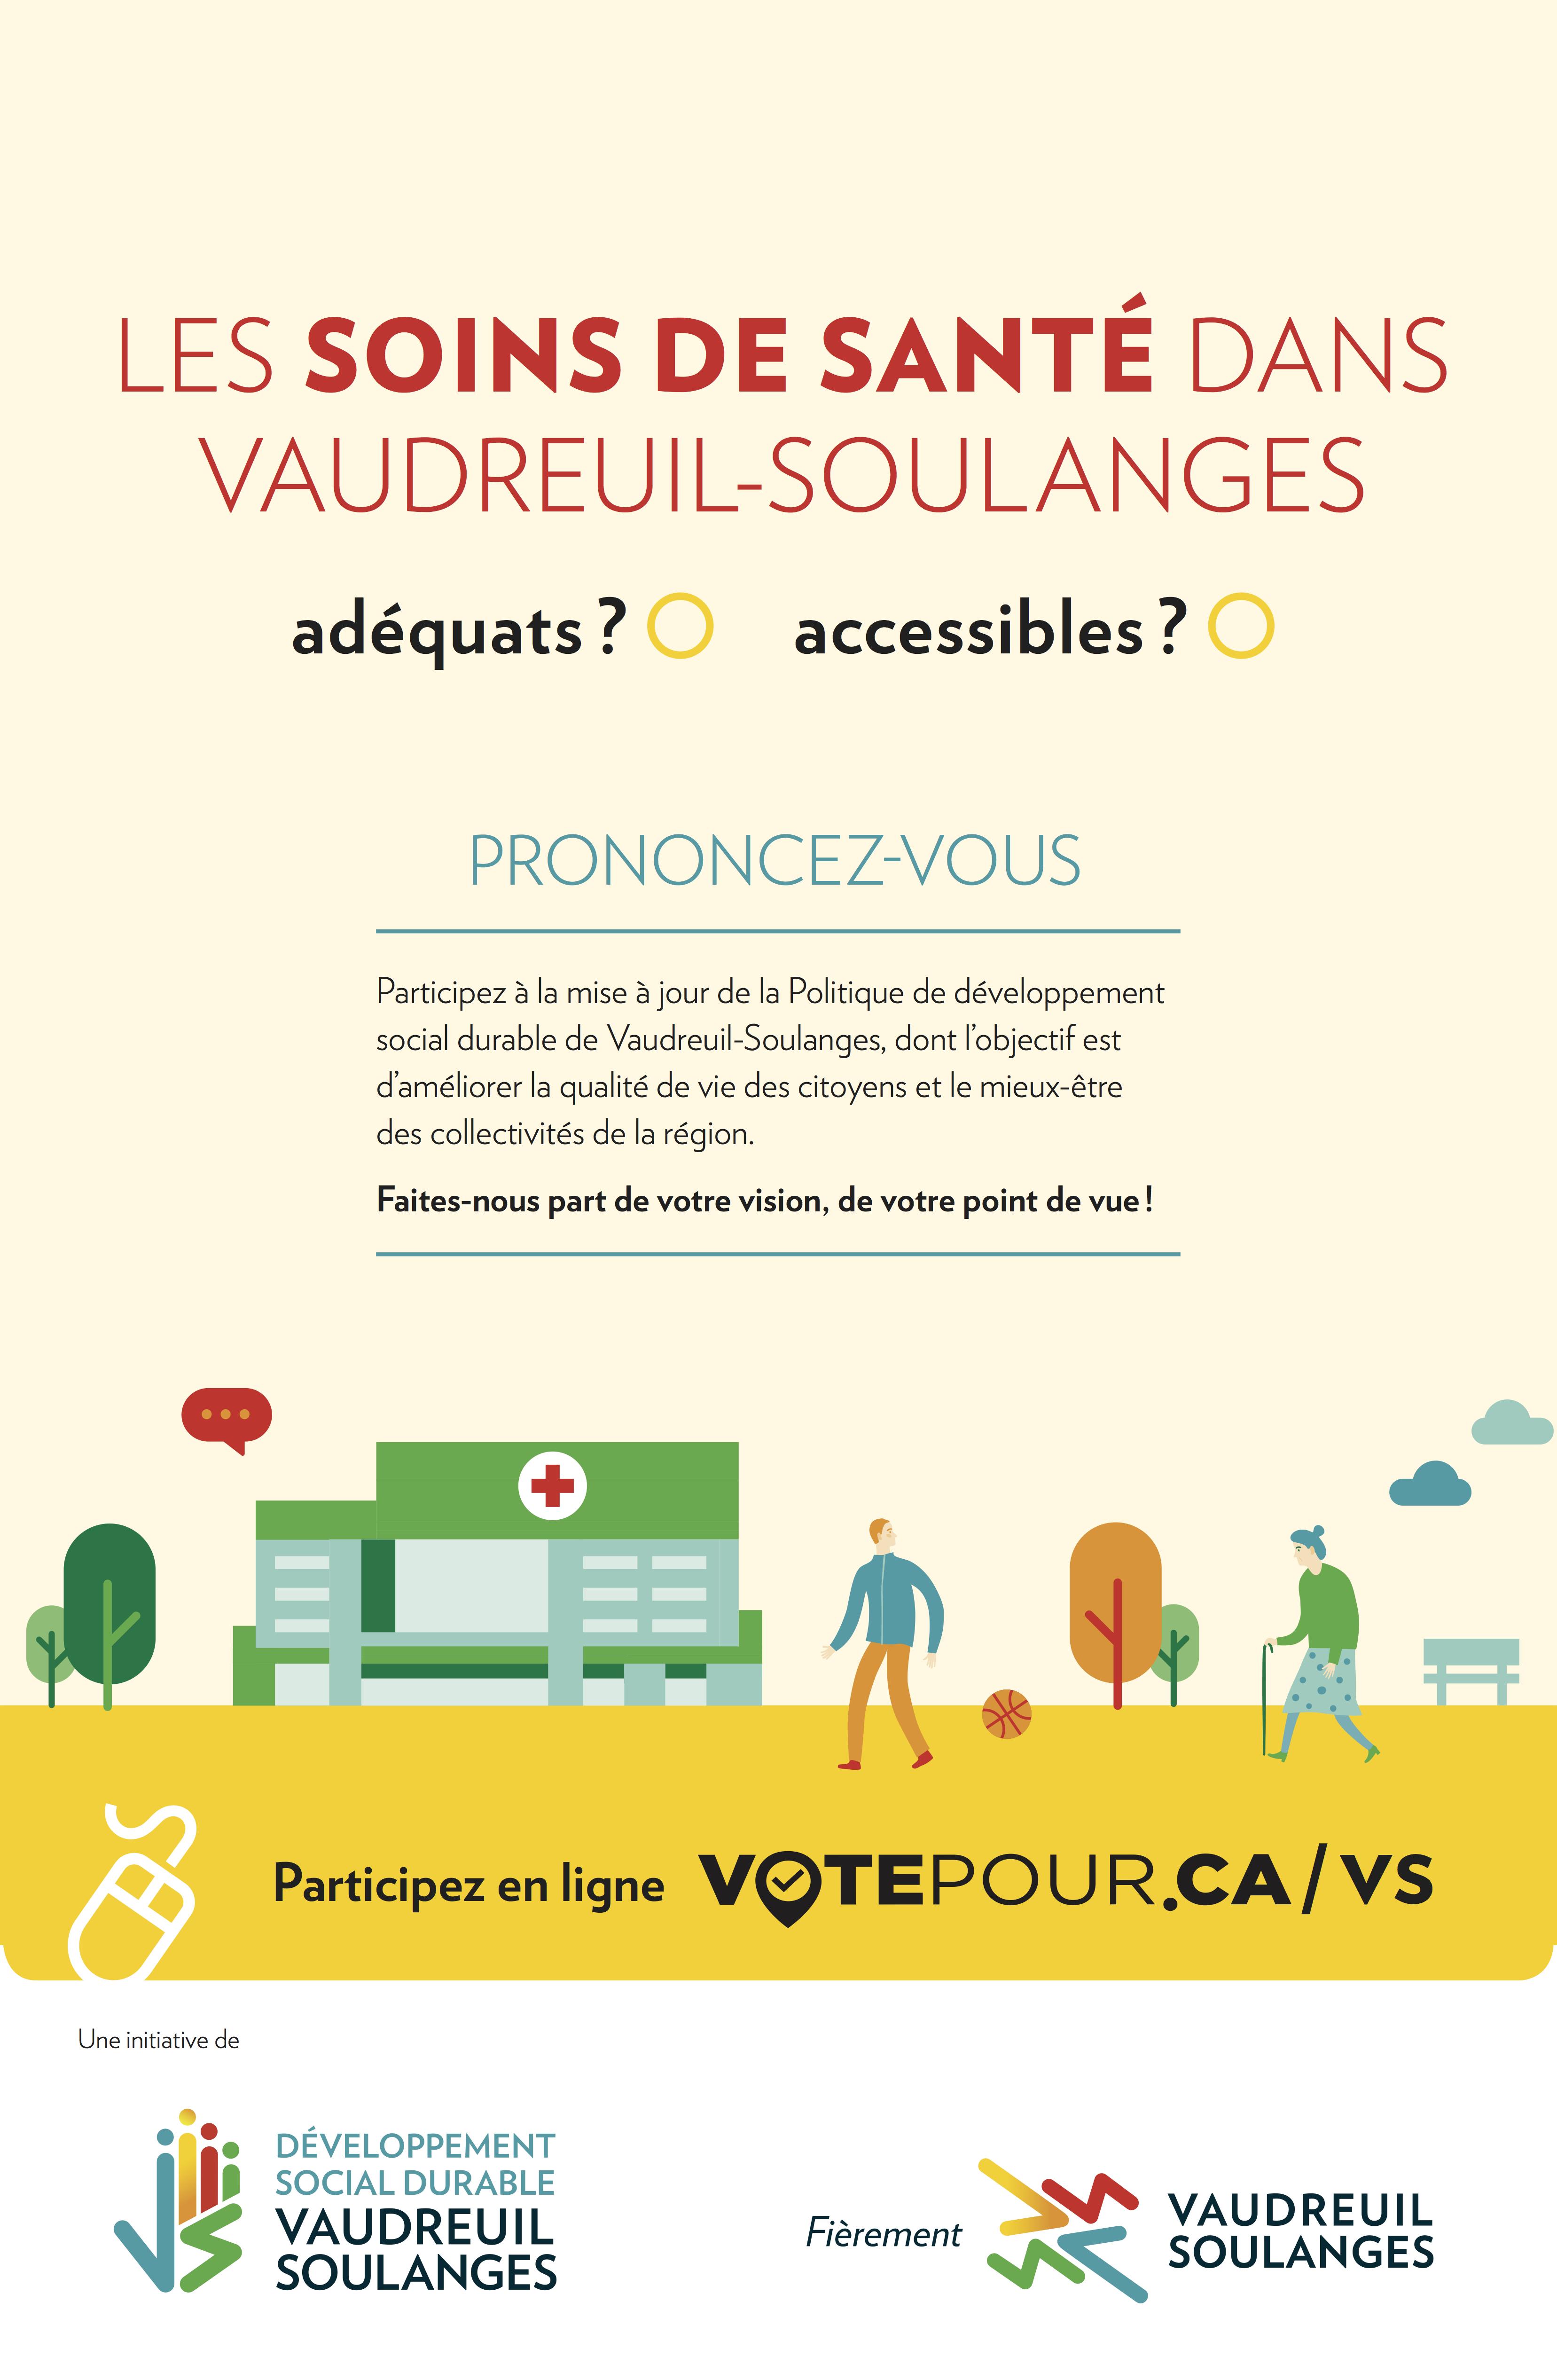 MRCVaudreuil_affiches_sante